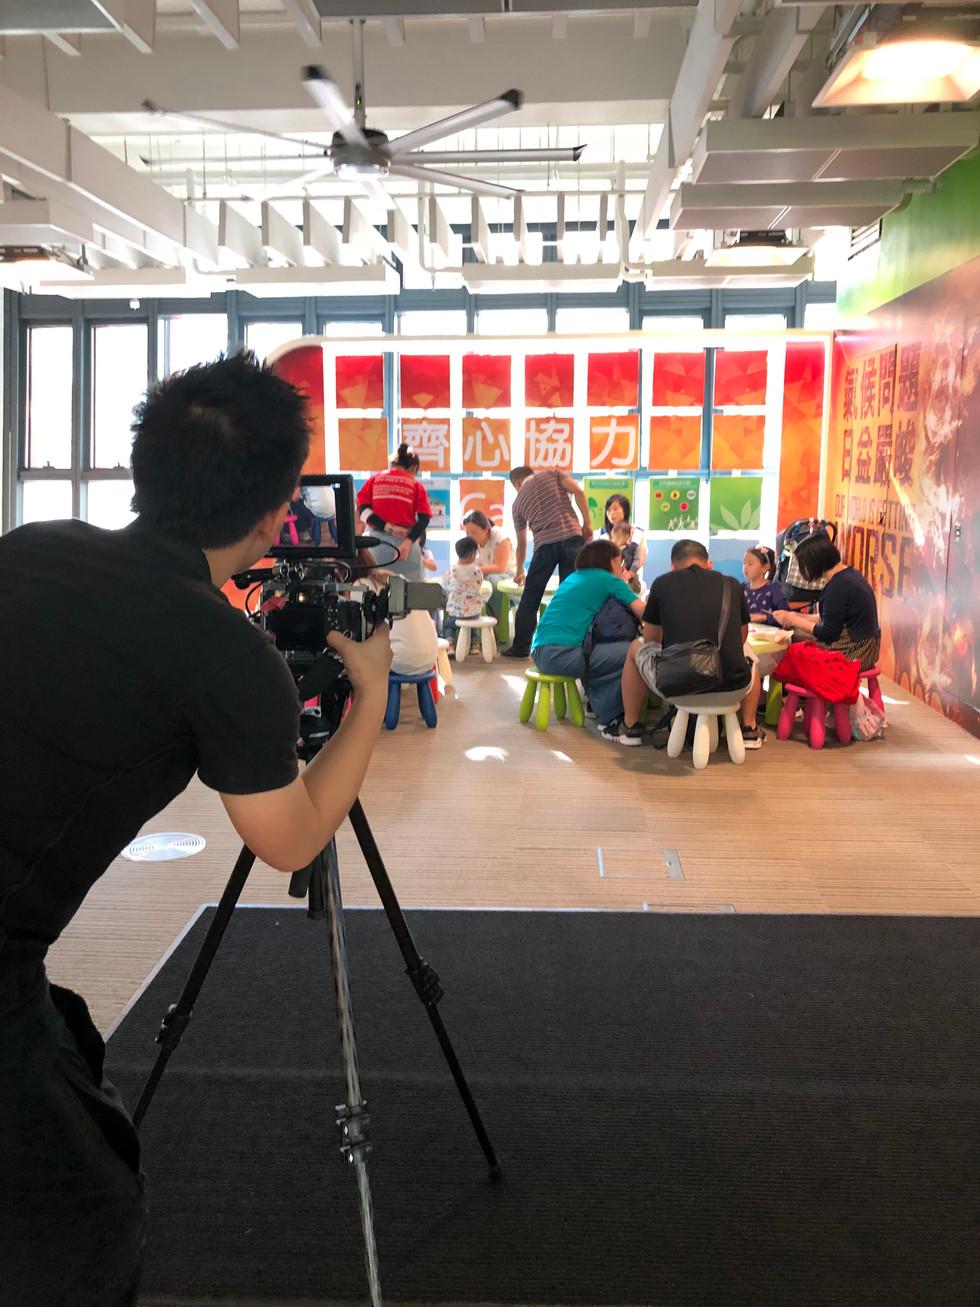 Videographer recording workshop of parents and children